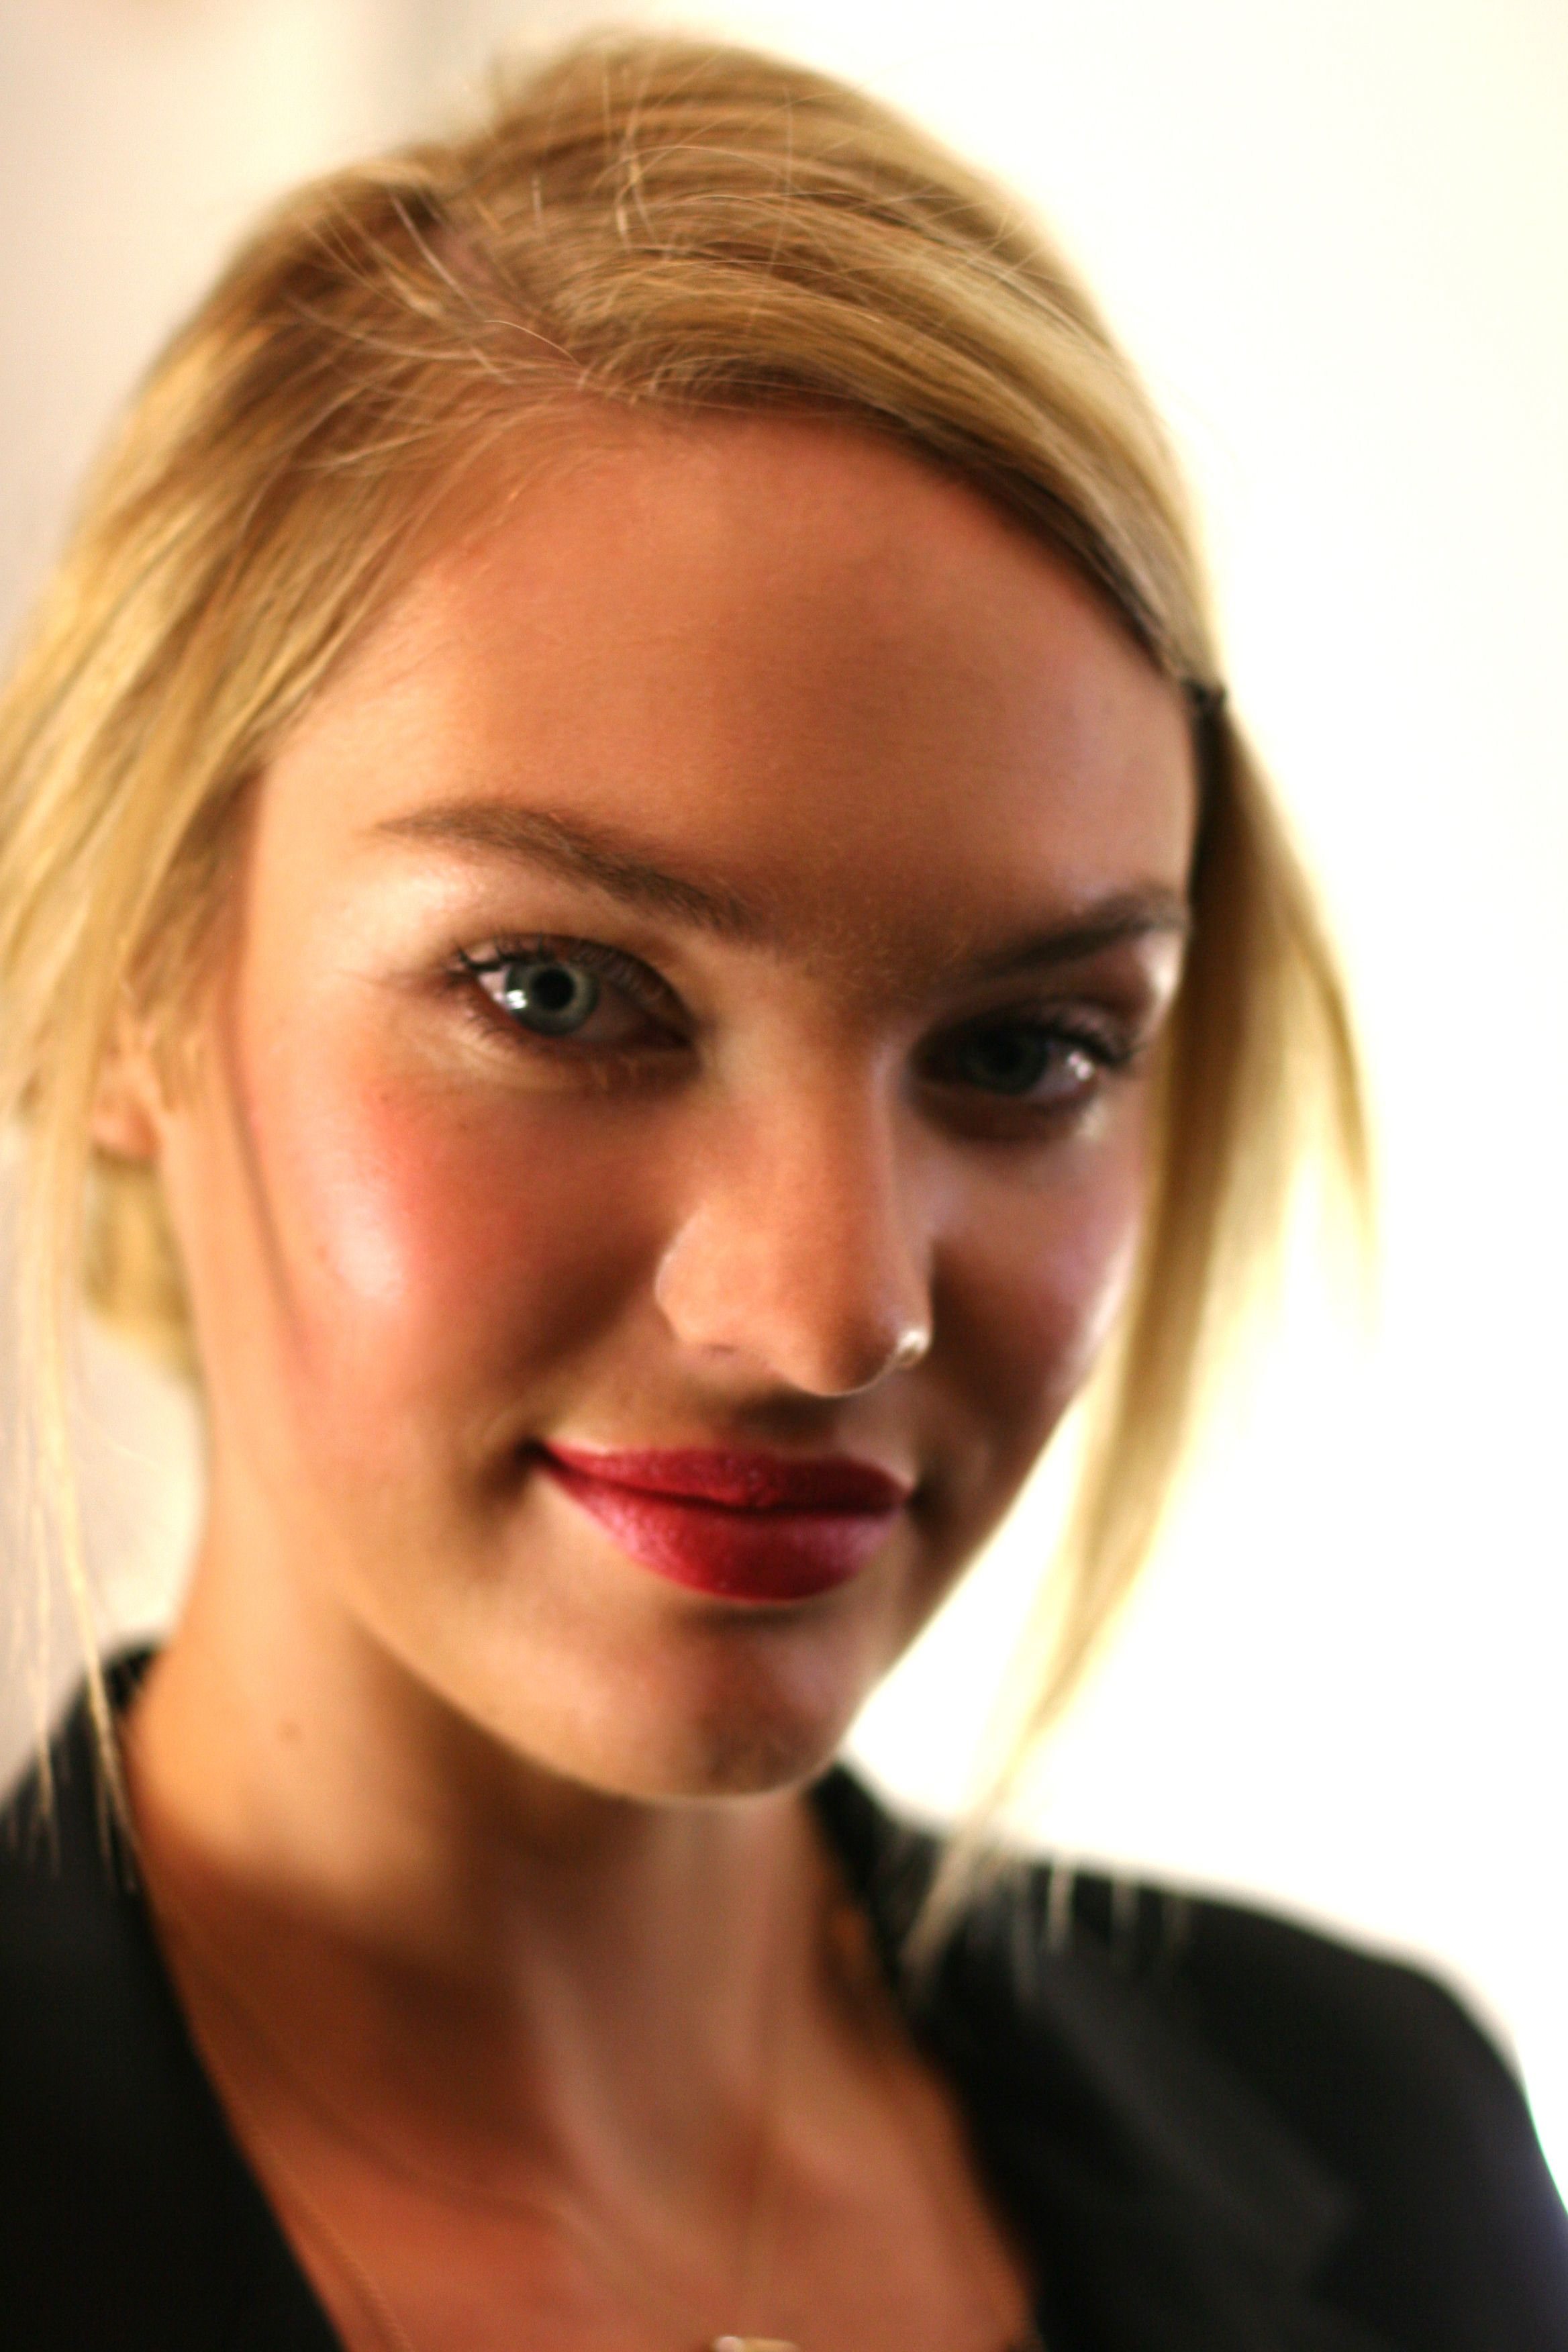 Candice Swanepoel | Head Turners | Pinterest